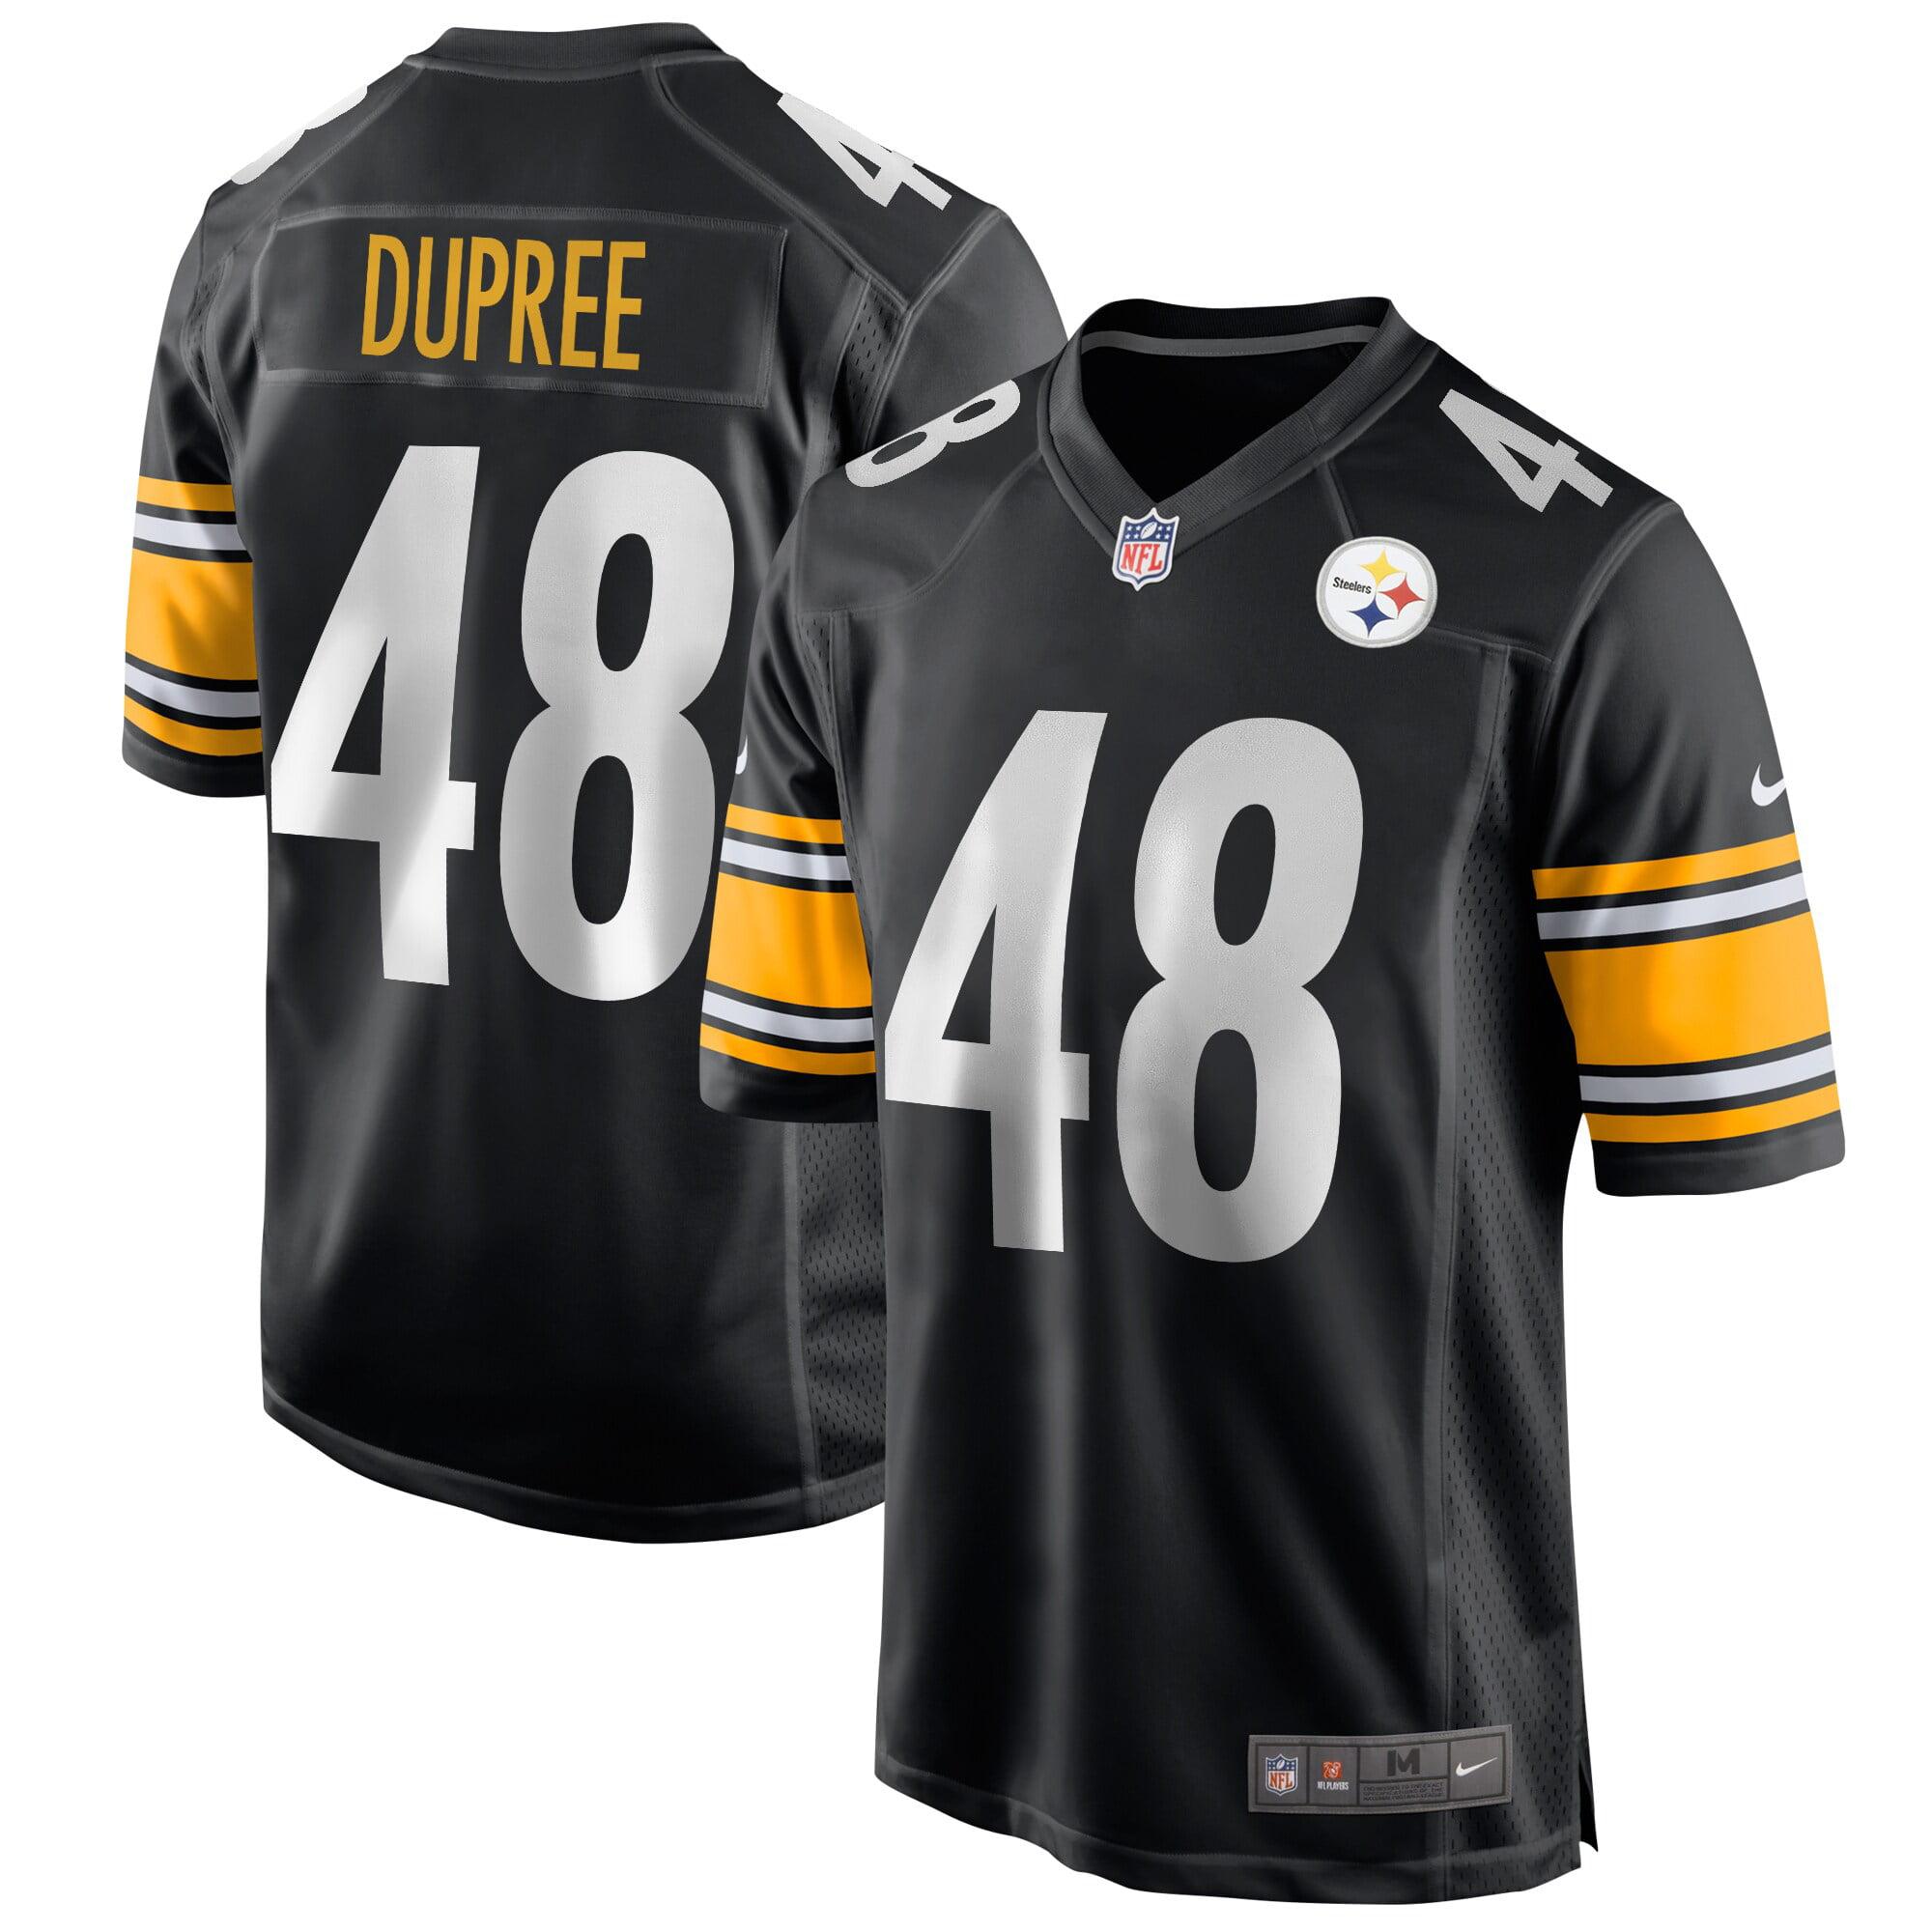 Bud Dupree Pittsburgh Steelers Nike Game Jersey - Black - Walmart.com